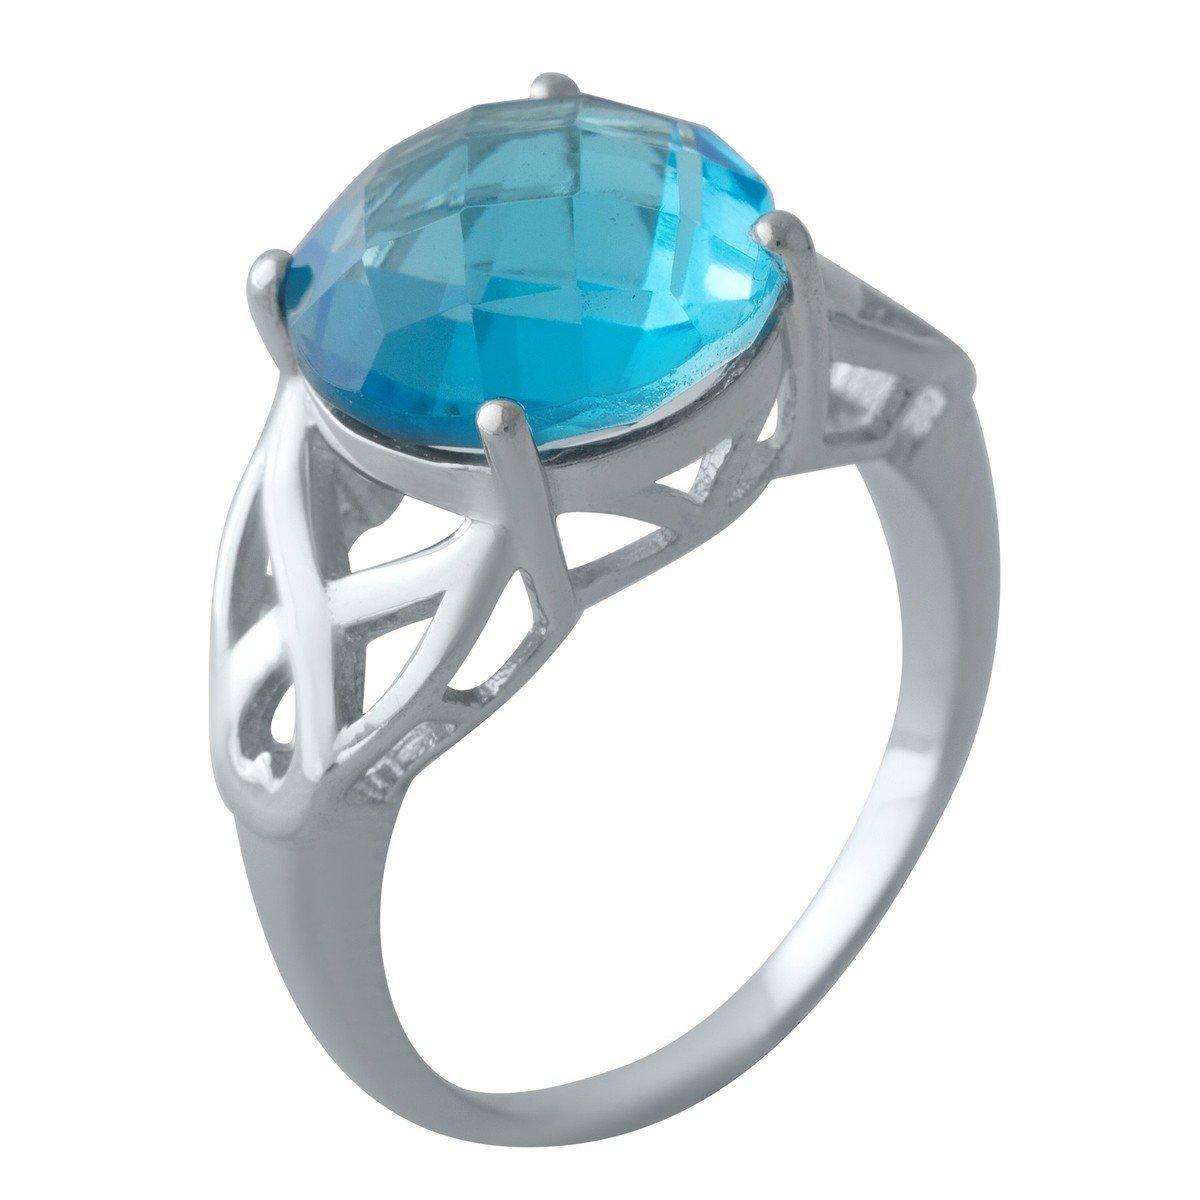 Серебряное кольцо pSilverAlex с аквамарином nano (2011910) 18 размер 4.73, 17.5